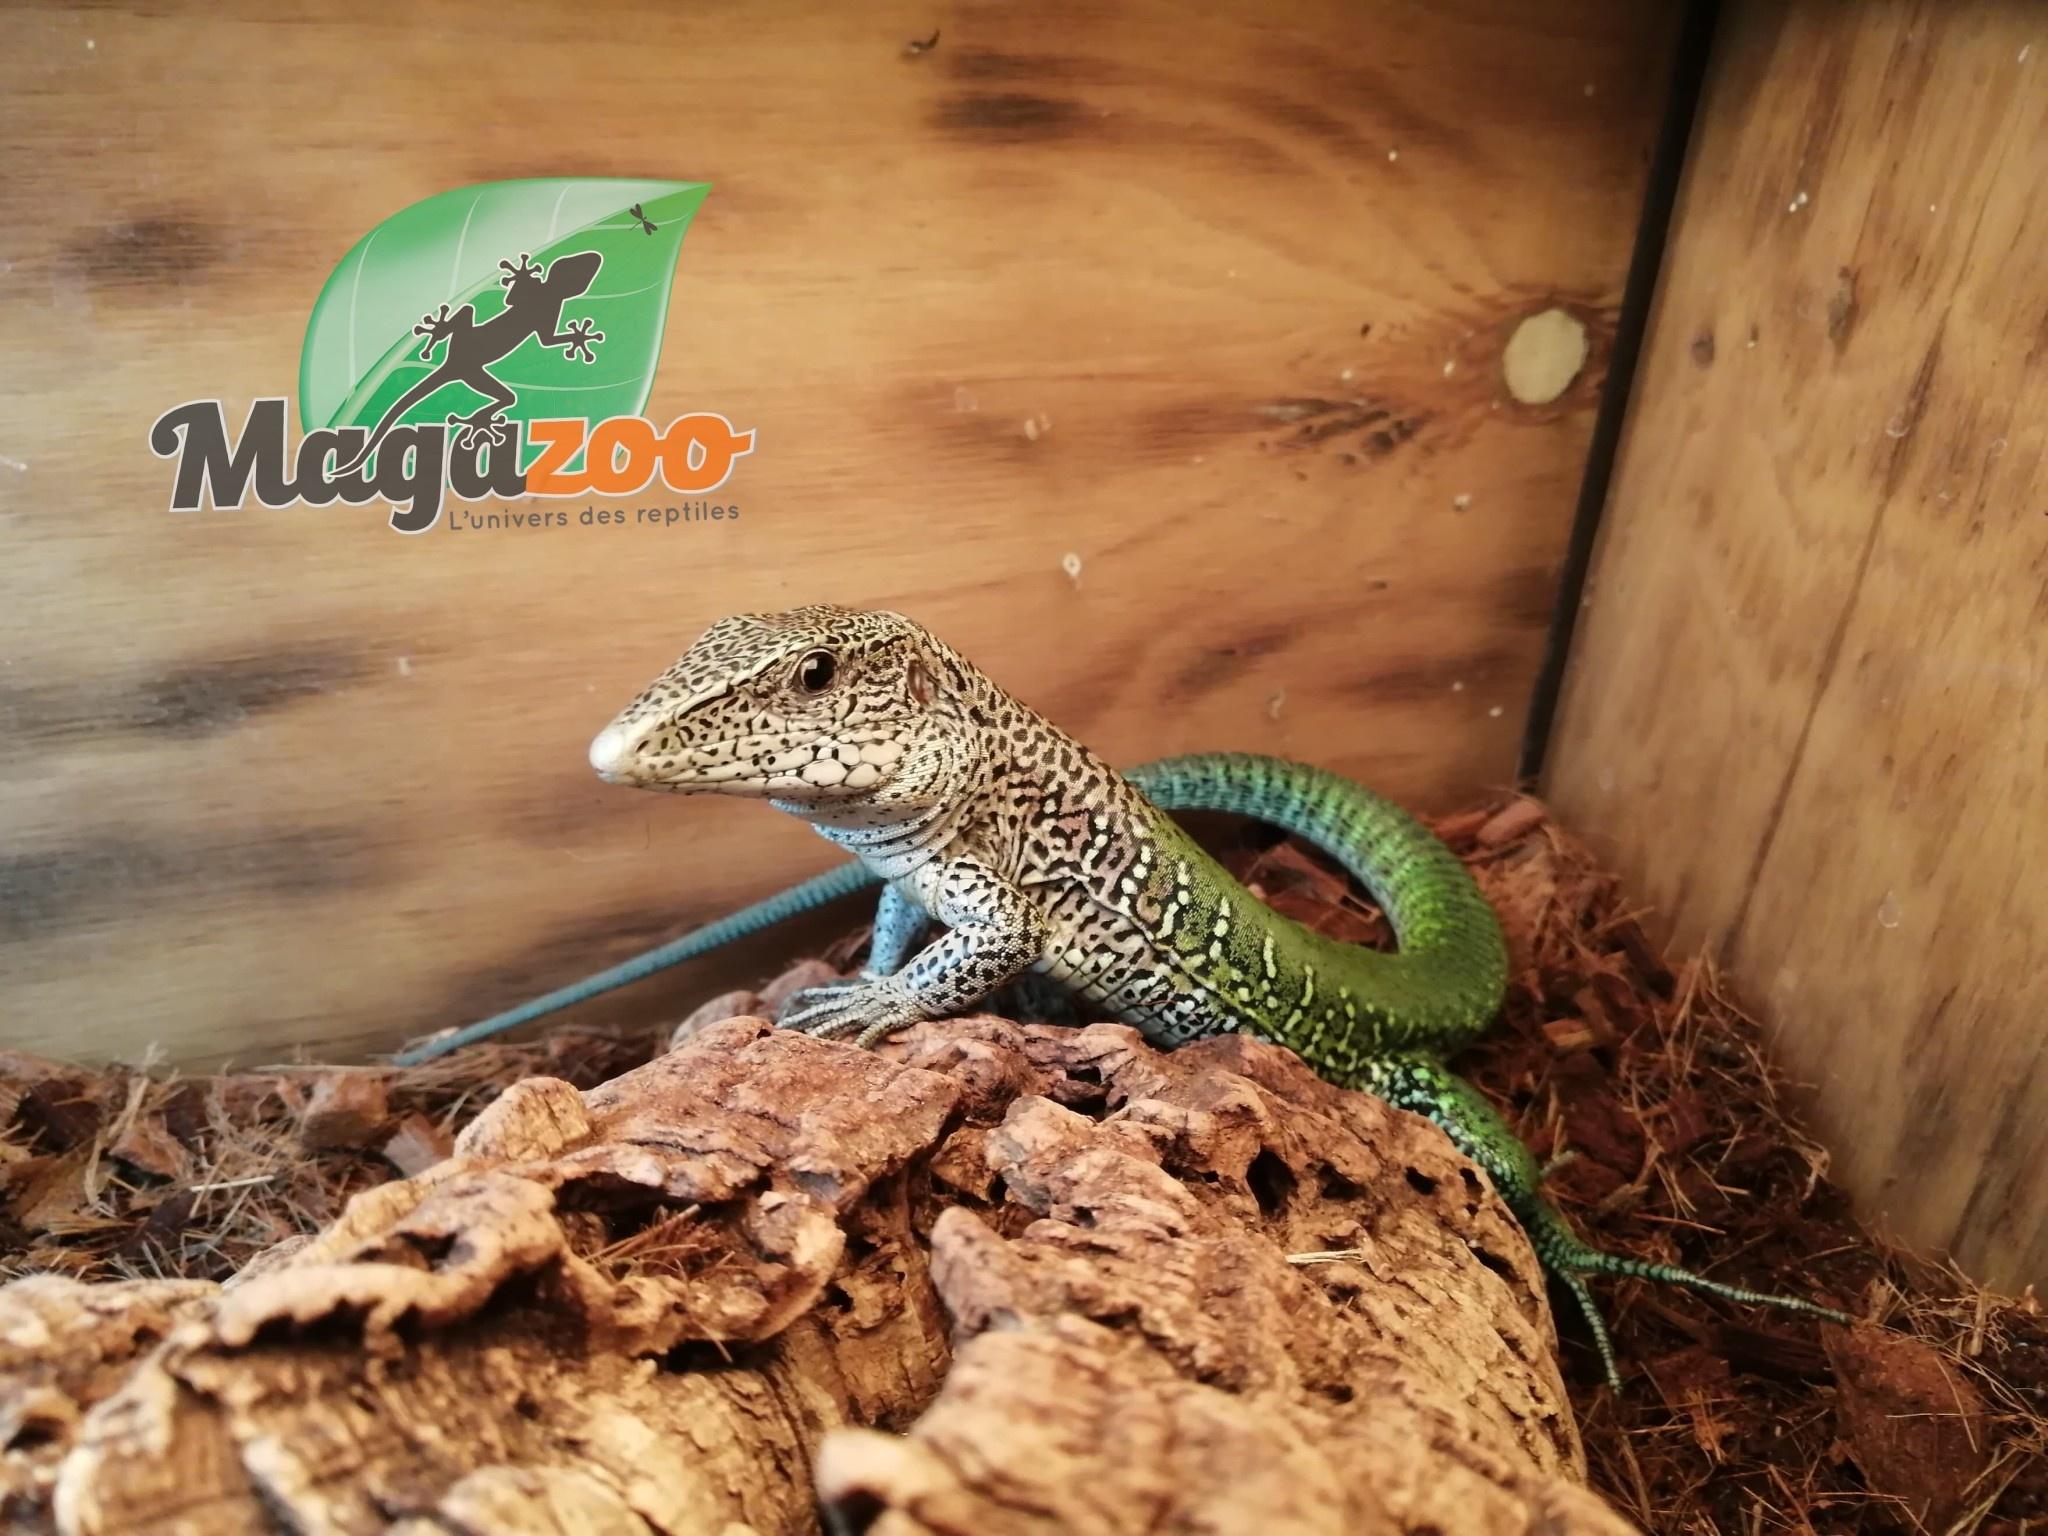 Magazoo Ameive Giant vert mâle sub-adulte